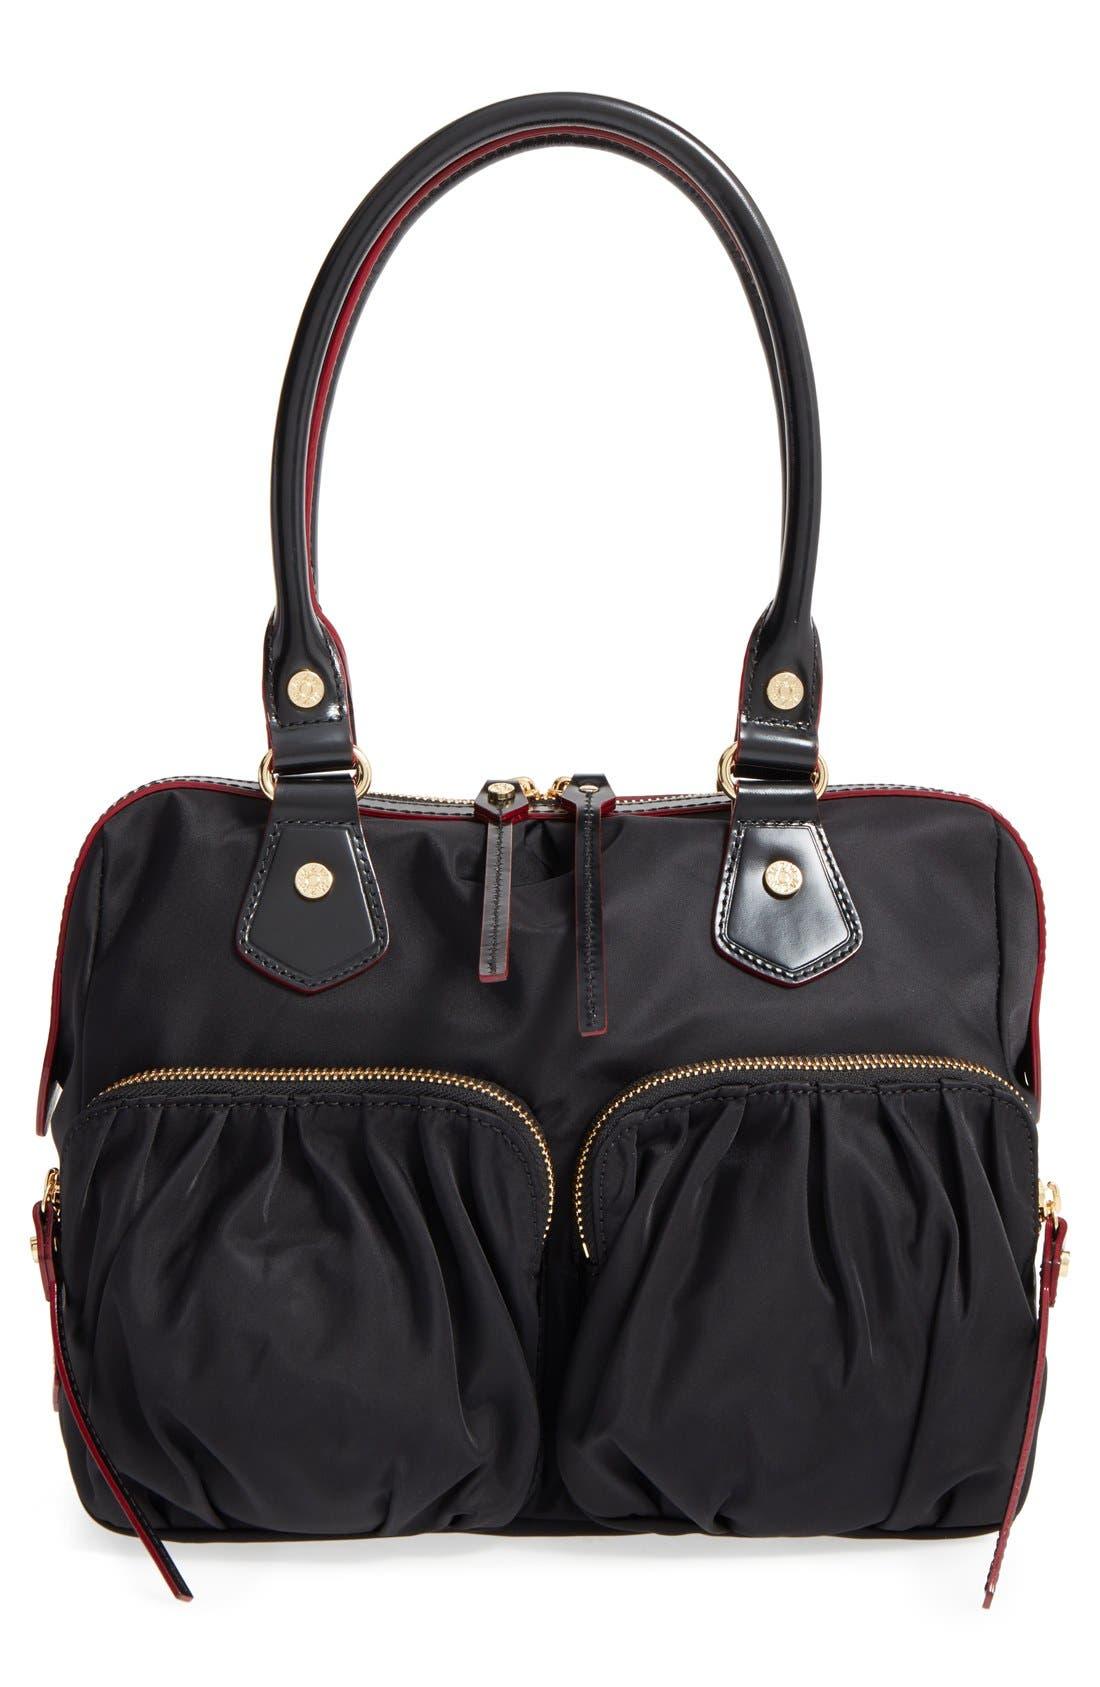 MZ WALLACE 'Baby Jane' Handbag